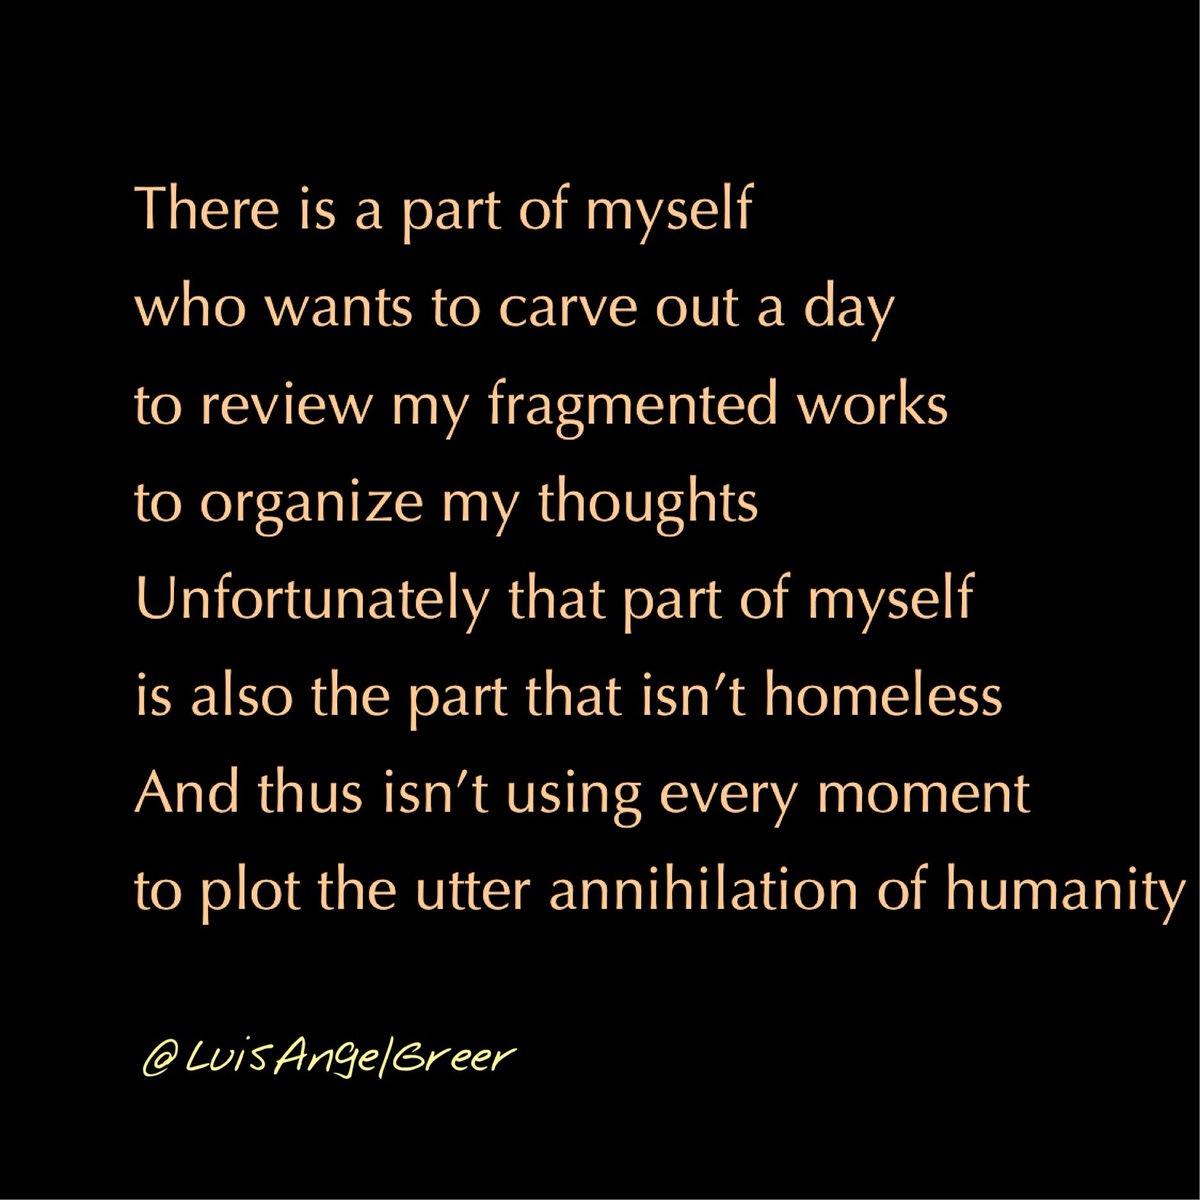 Prioritization Management [200223 103747]  #poem #poetry #prose #bleedingedgepoetry #originalpoetry #poetryforthesoul #spilledwords #spilledthoughts #spilledink #darkpoetry #love #lovepoem #lovepoemspic.twitter.com/5FKhEvWO3d